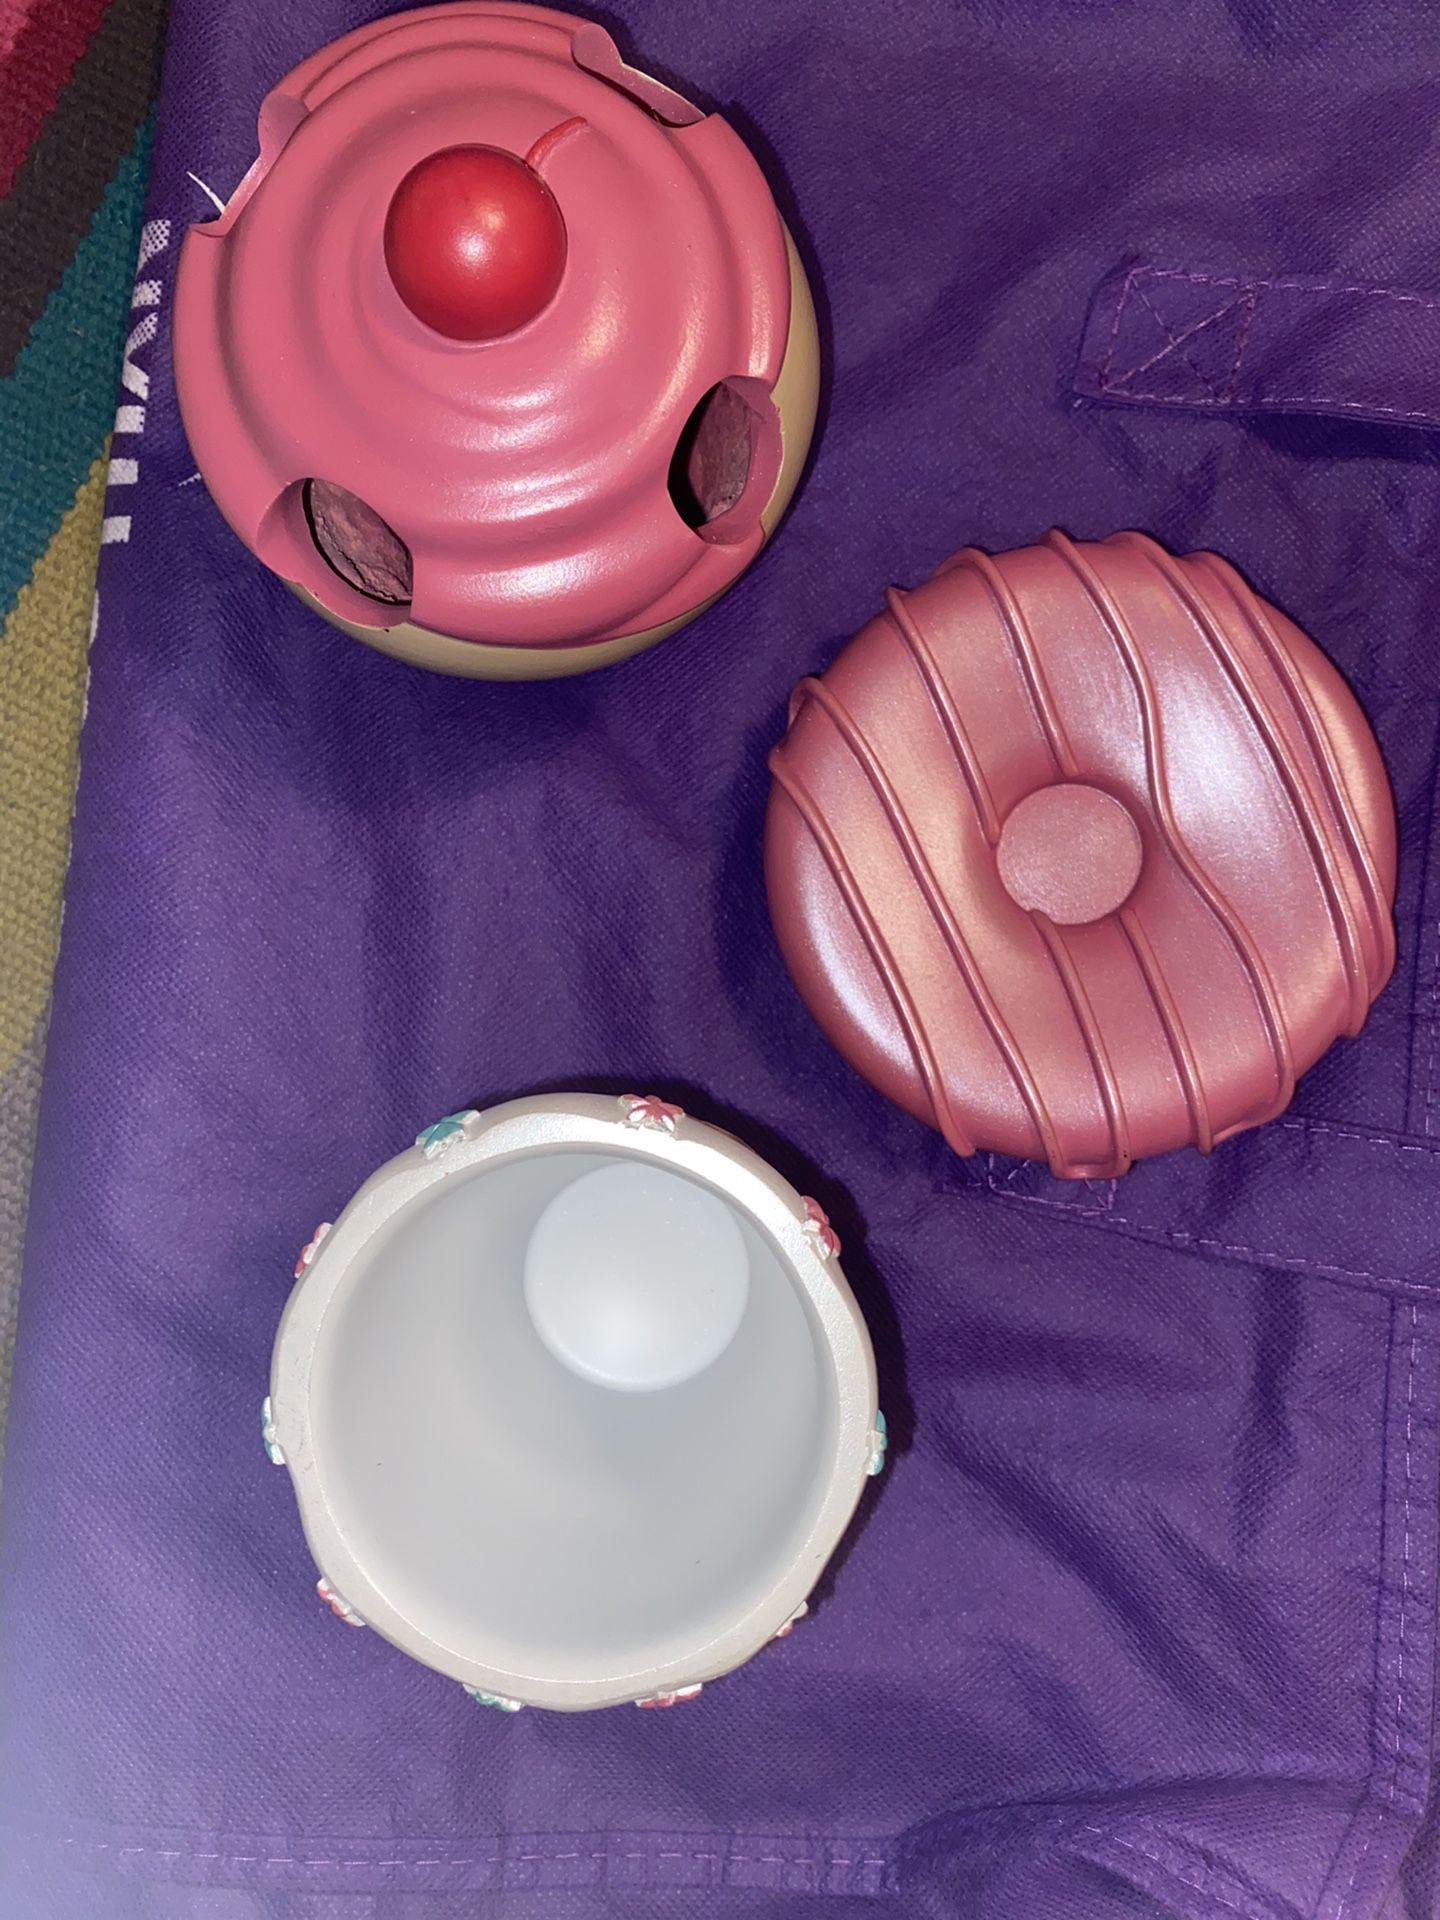 Cupcake Bathroom Accessories Set